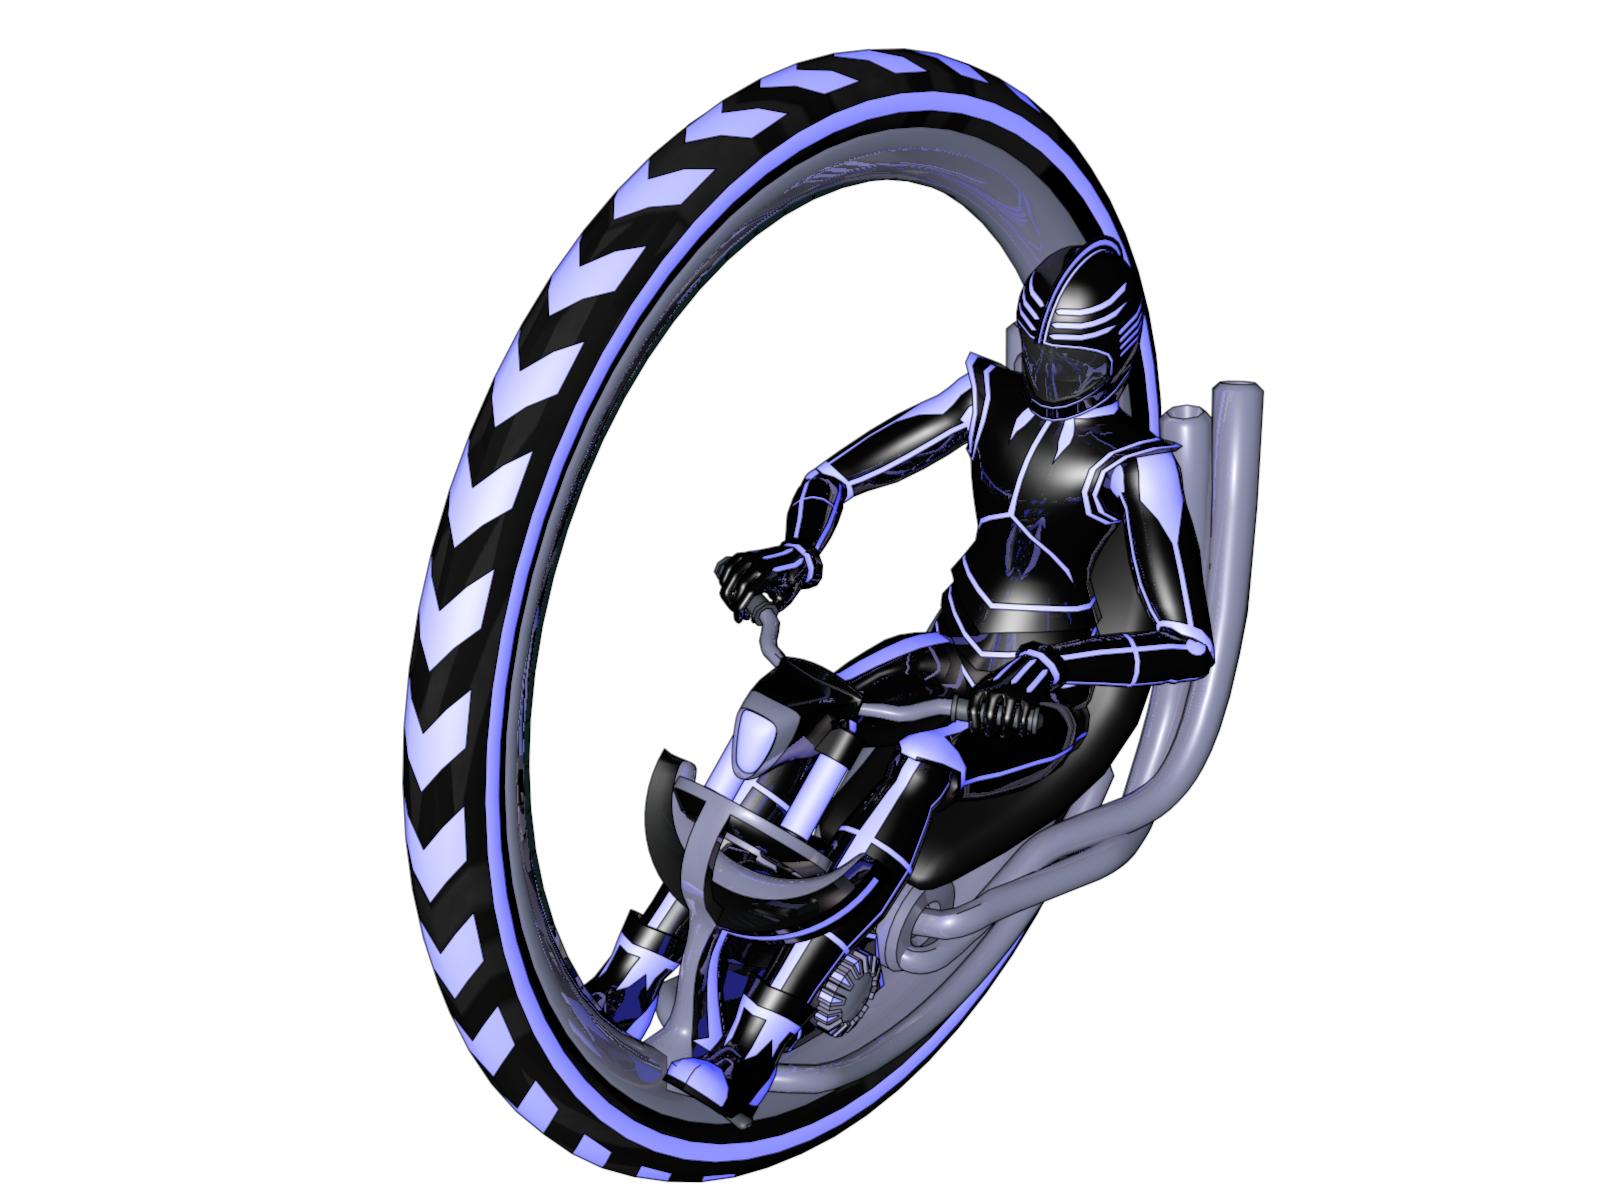 Monowheel Cycle Isometric View